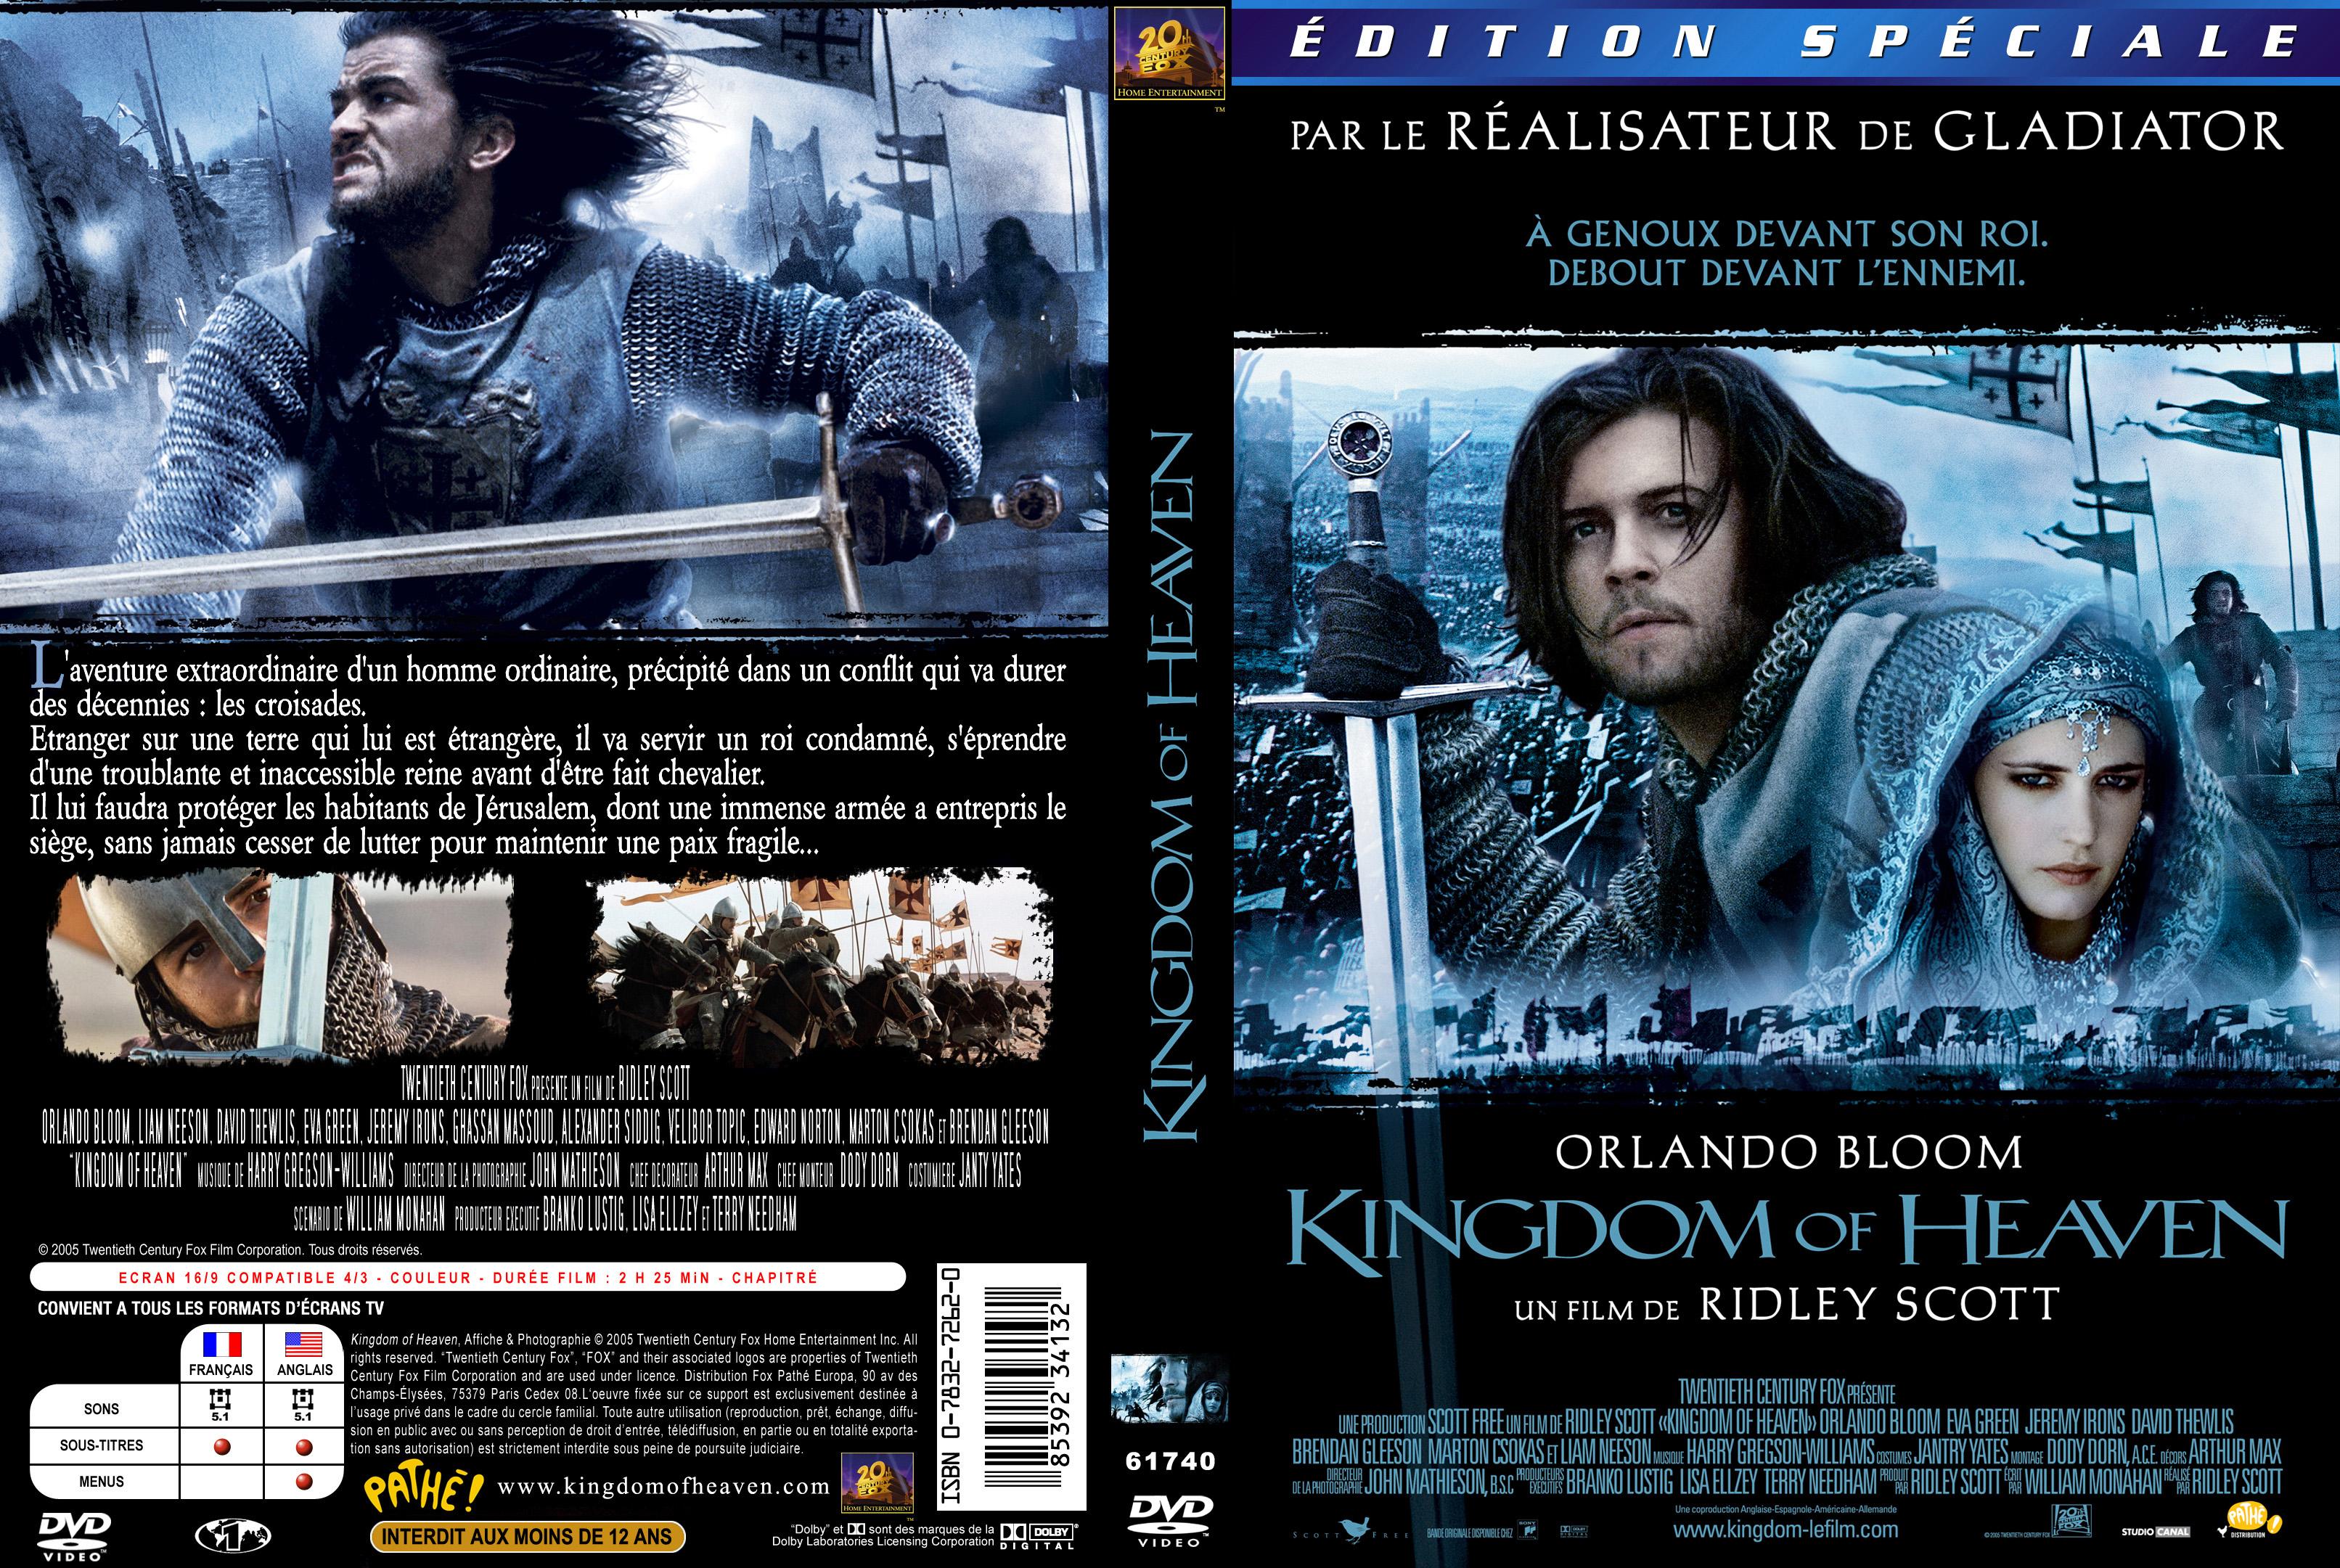 This is a photo of Gargantuan Kingdom of Heaven Dvd Label